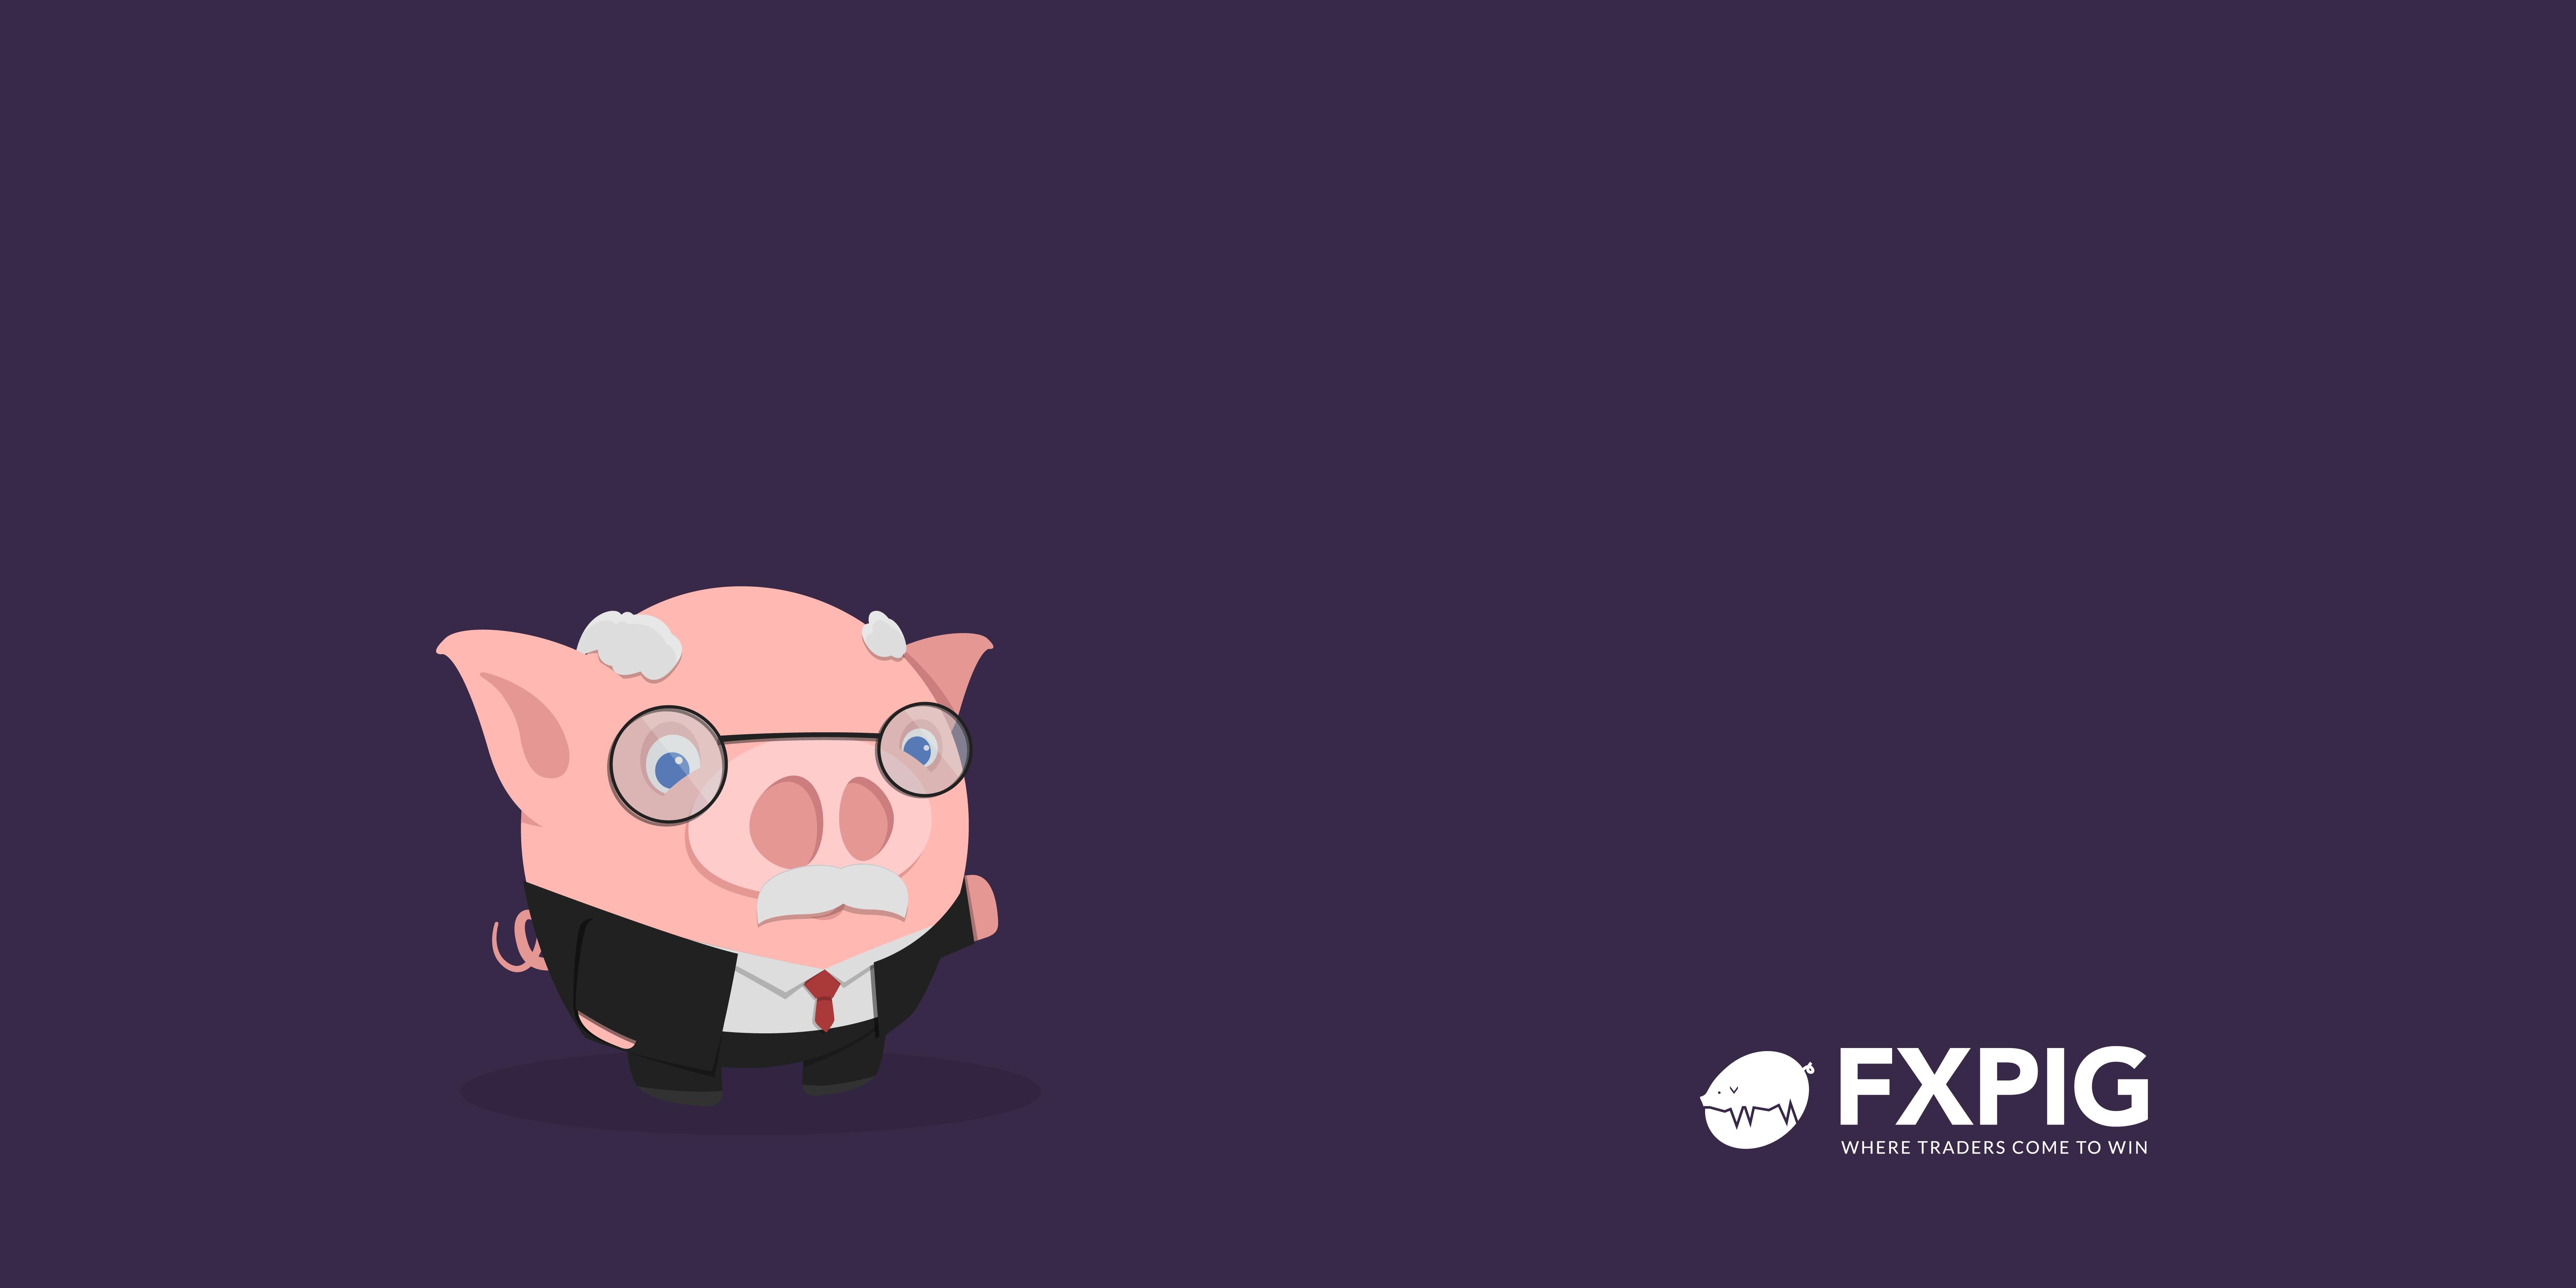 FOREX_trading-quote_wisdom-pig-insider_FXPIG